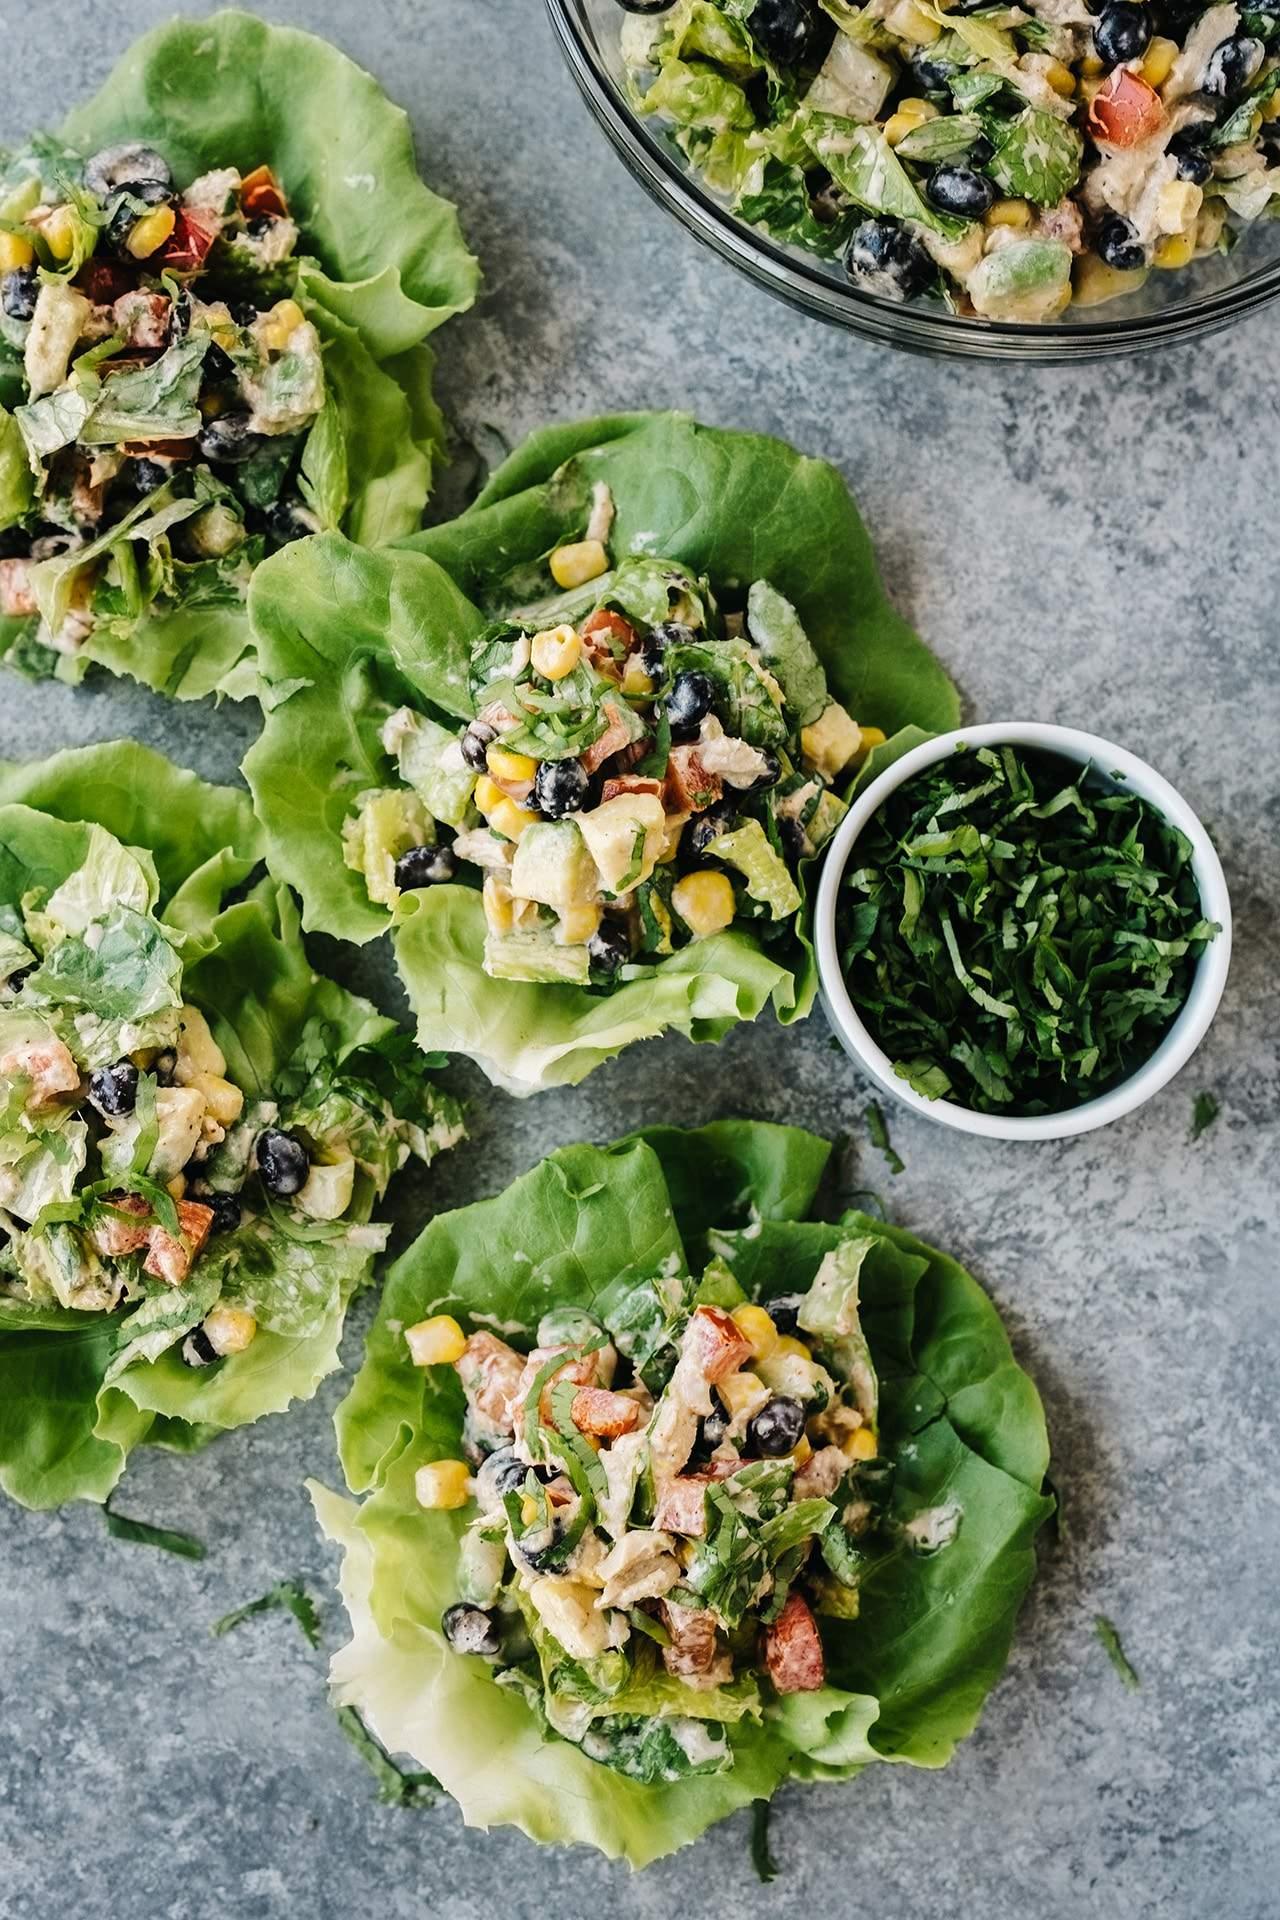 "Mexican chopped tuna salad ""width ="" 1280 ""height ="" 1920 ""srcset ="" https://cdn.diys.com/wp-content/uploads/2020/06/Mexican-chopped-tuna-salad.jpg 1280w, https : //cdn.diys.com/wp-content/uploads/2020/06/Mexican-chopped-tuna-salad-200x300.jpg 200w, https://cdn.diys.com/wp-content/uploads/2020/ 06 / mexican chopped tuna salad-683x1024.jpg 683w, https://cdn.diys.com/wp-content/uploads/2020/06/Mexican-chopped-tuna-salad-768x1152.jpg 768w, https: // cdn .diys.com / wp-content / uploads / 2020/06 / Mexican-chopped-tuna-salad-1024x1536.jpg 1024w ""dimensions ="" (maximum width: 1280px) 100vw, 1280px"